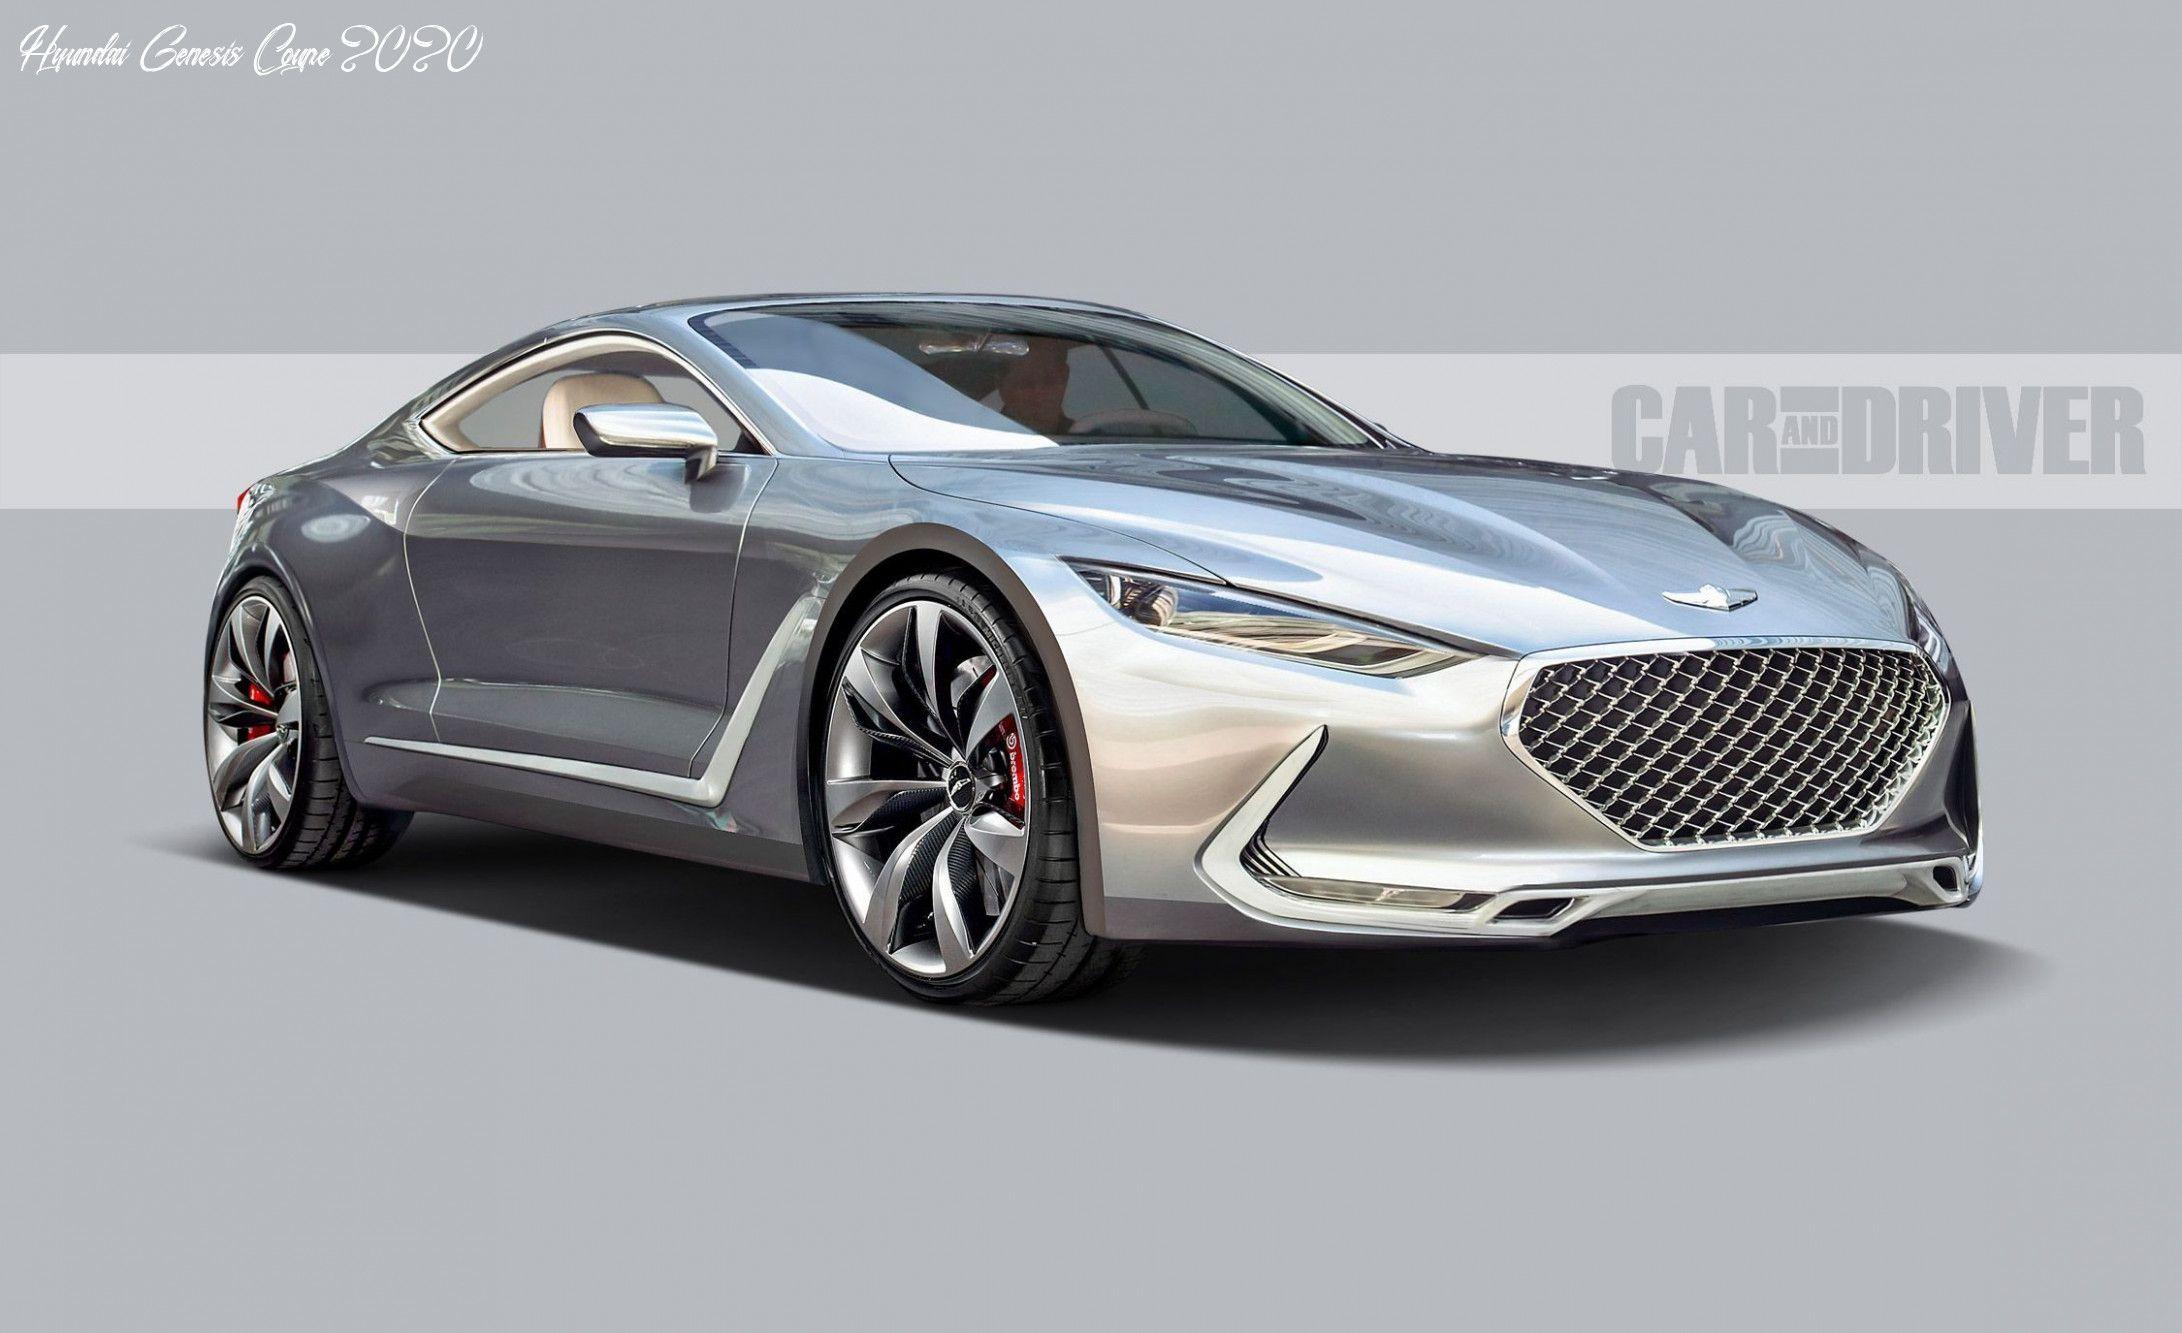 Hyundai Genesis Coupe 2020 Concept In 2020 Hyundai Genesis Coupe Car And Driver Car